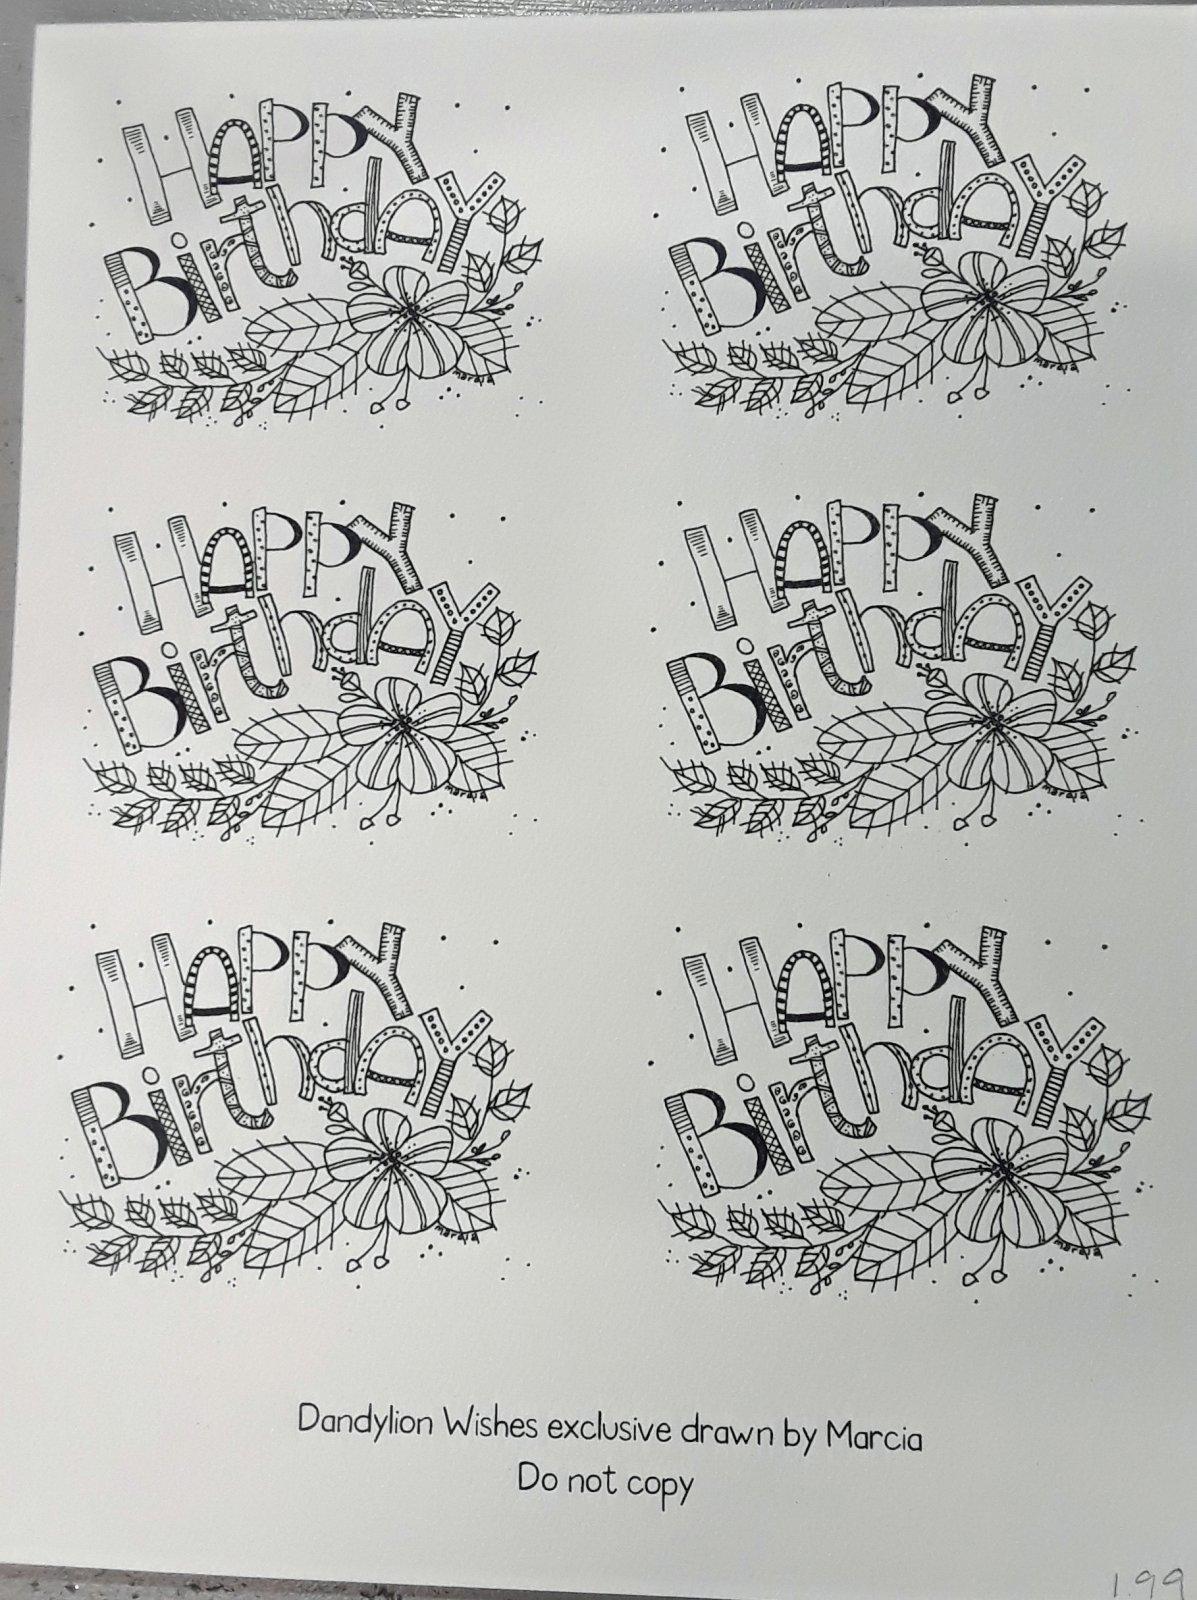 Dandylion Wishes Exclusive 3x4 Happy Birthday sheet